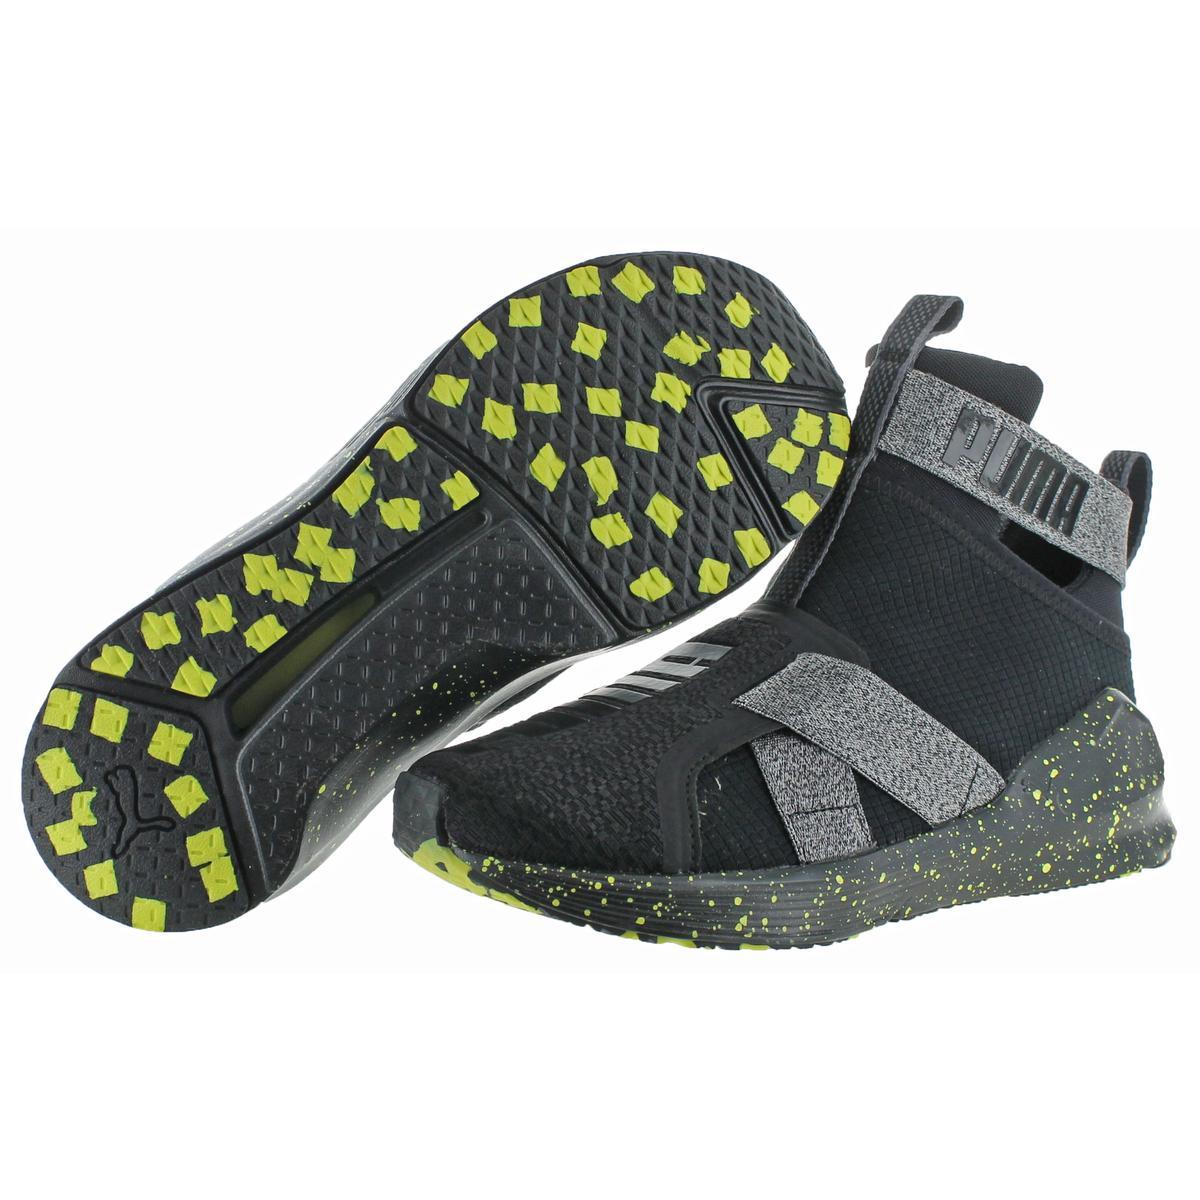 Puma Fierce Fashion Strap Terrain Damenschuhe Speckled Slip On Training Fashion Fierce Sneaker Schuhes 66bd04